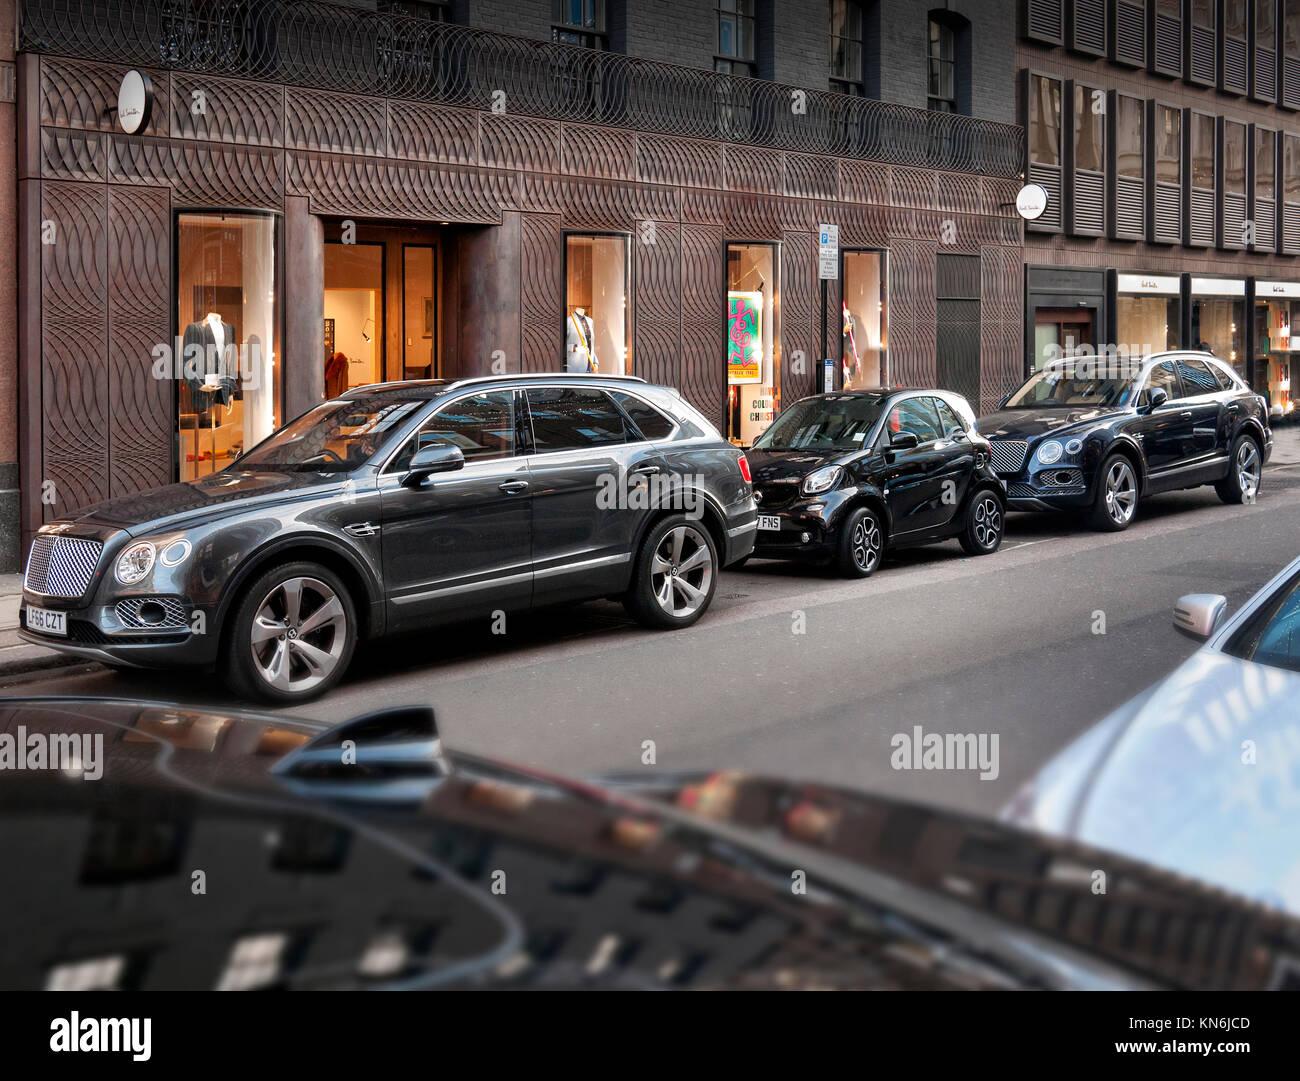 Bentley Bentayga's with Smart car parked in Albemarle Street London UK - Stock Image